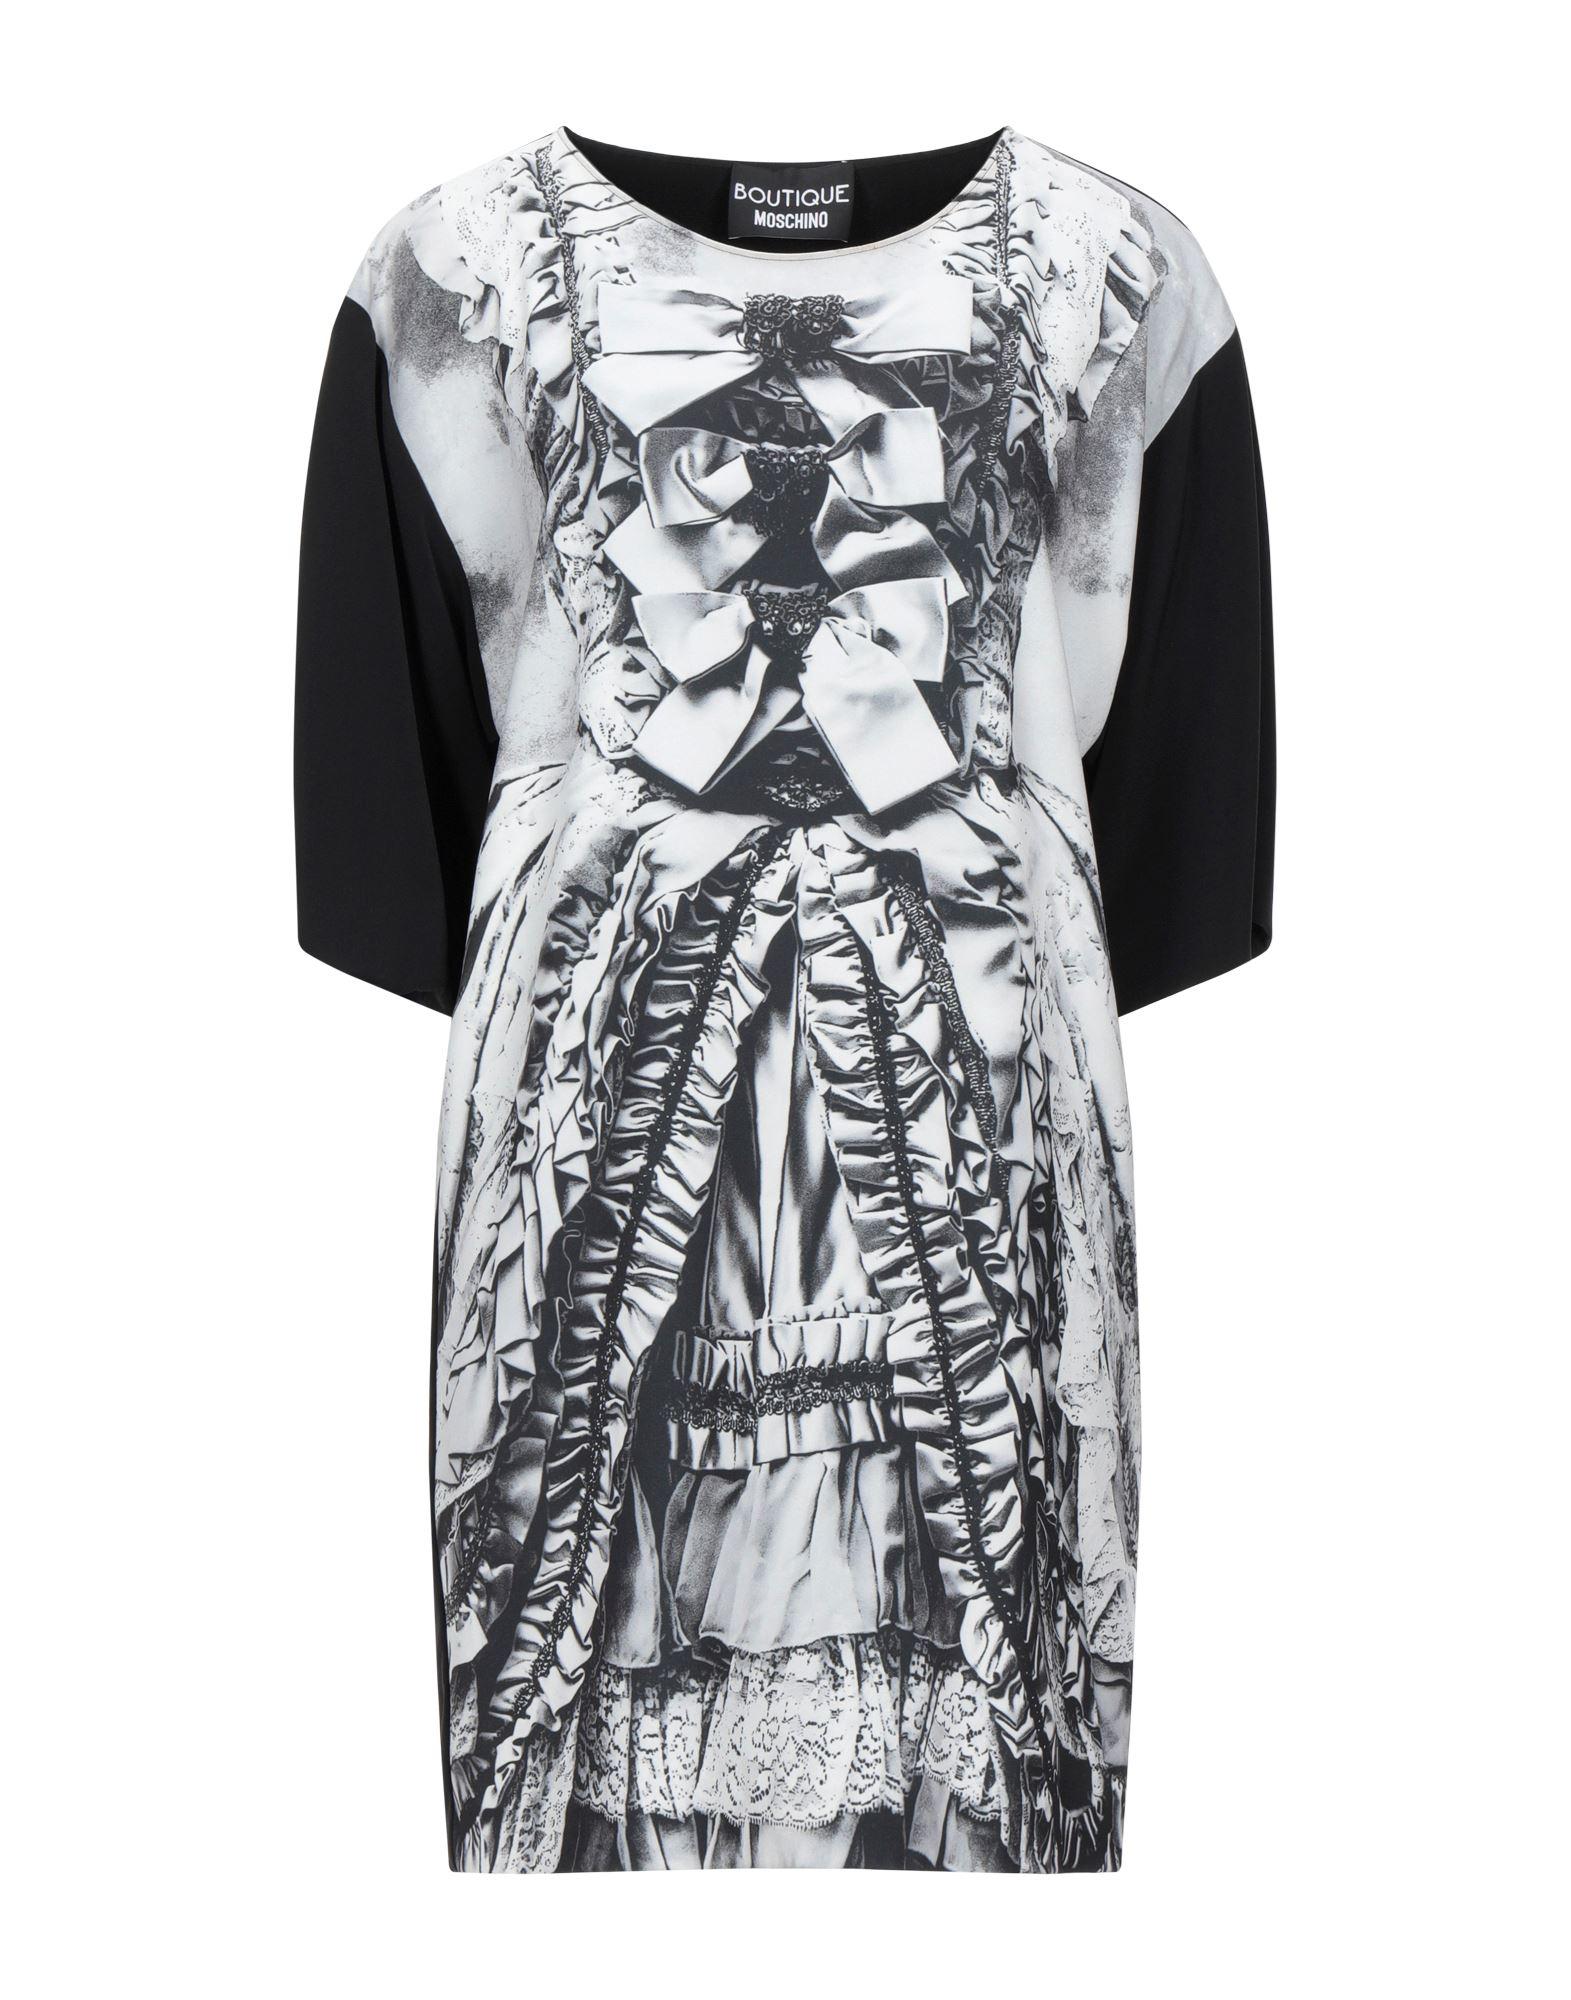 BOUTIQUE MOSCHINO Короткое платье фото